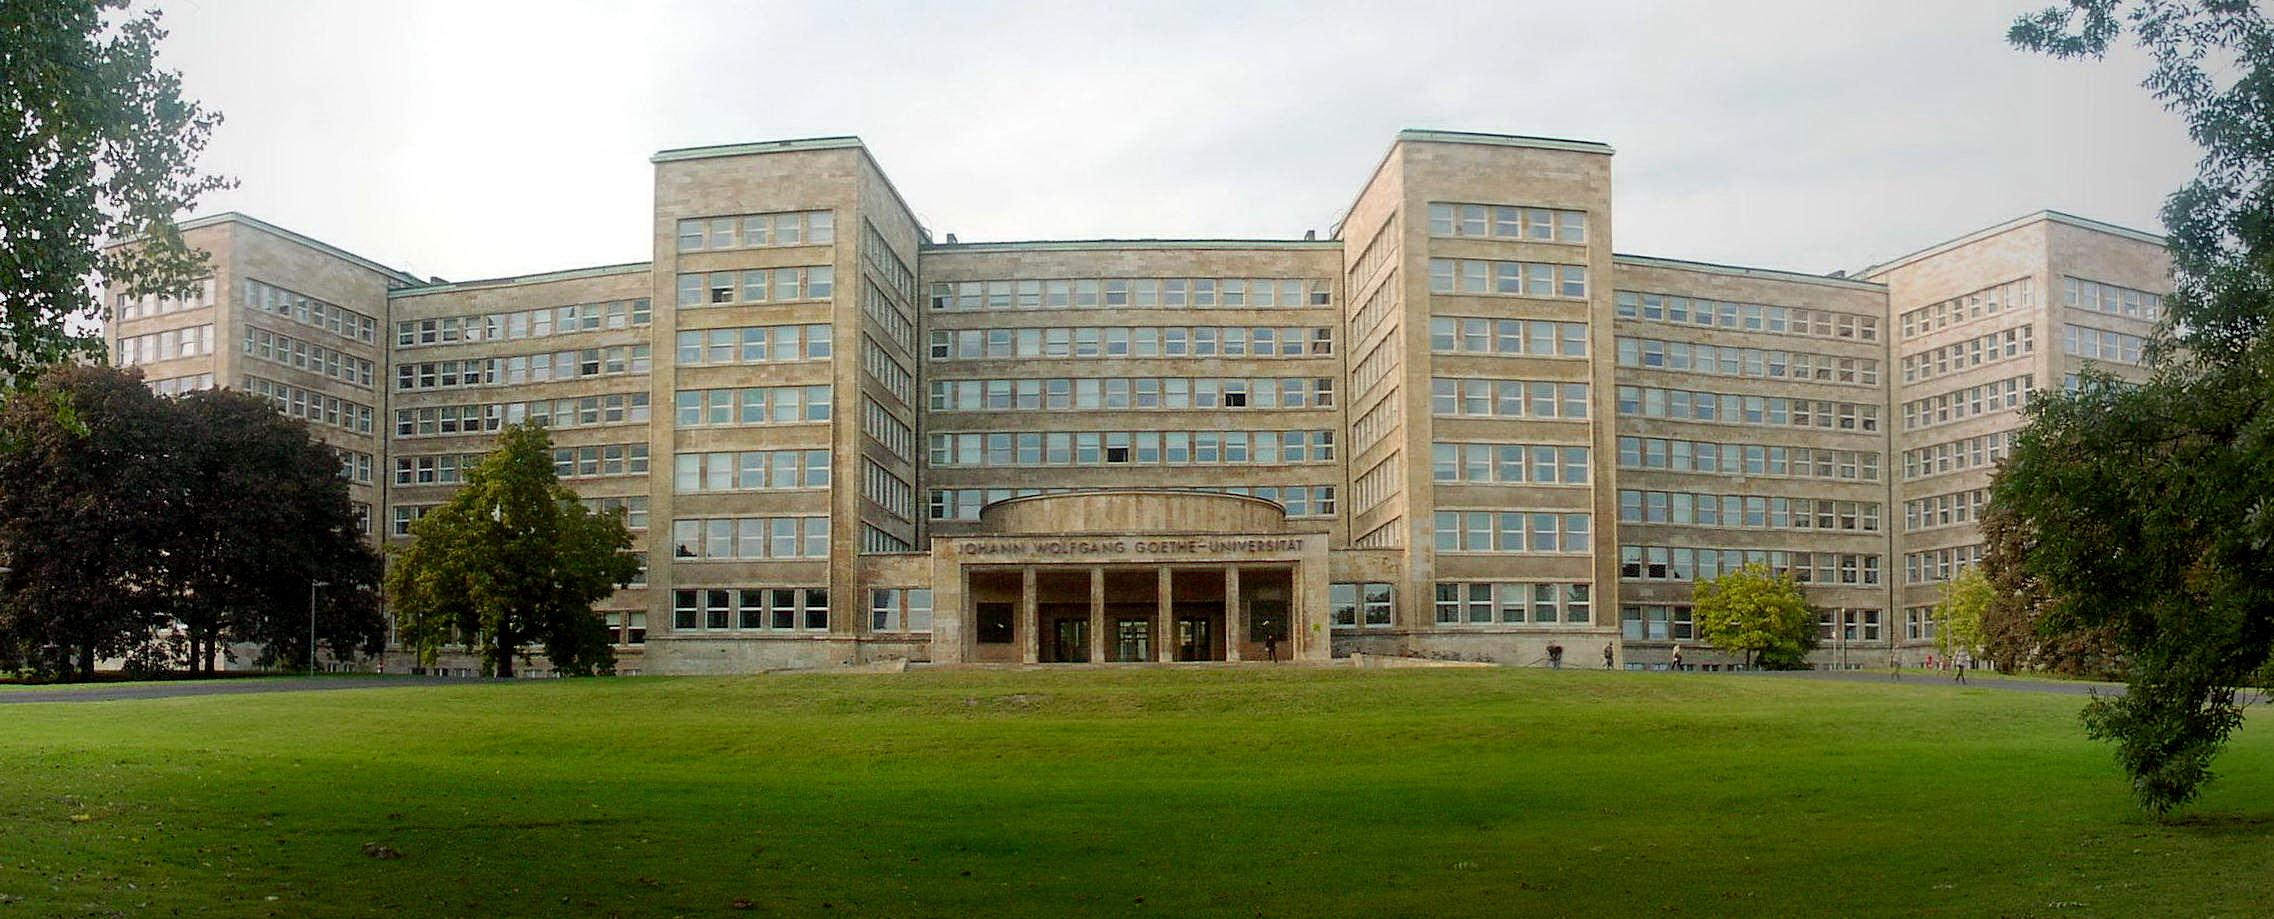 Goethe_University_Frankfurt_Poelzig_Building